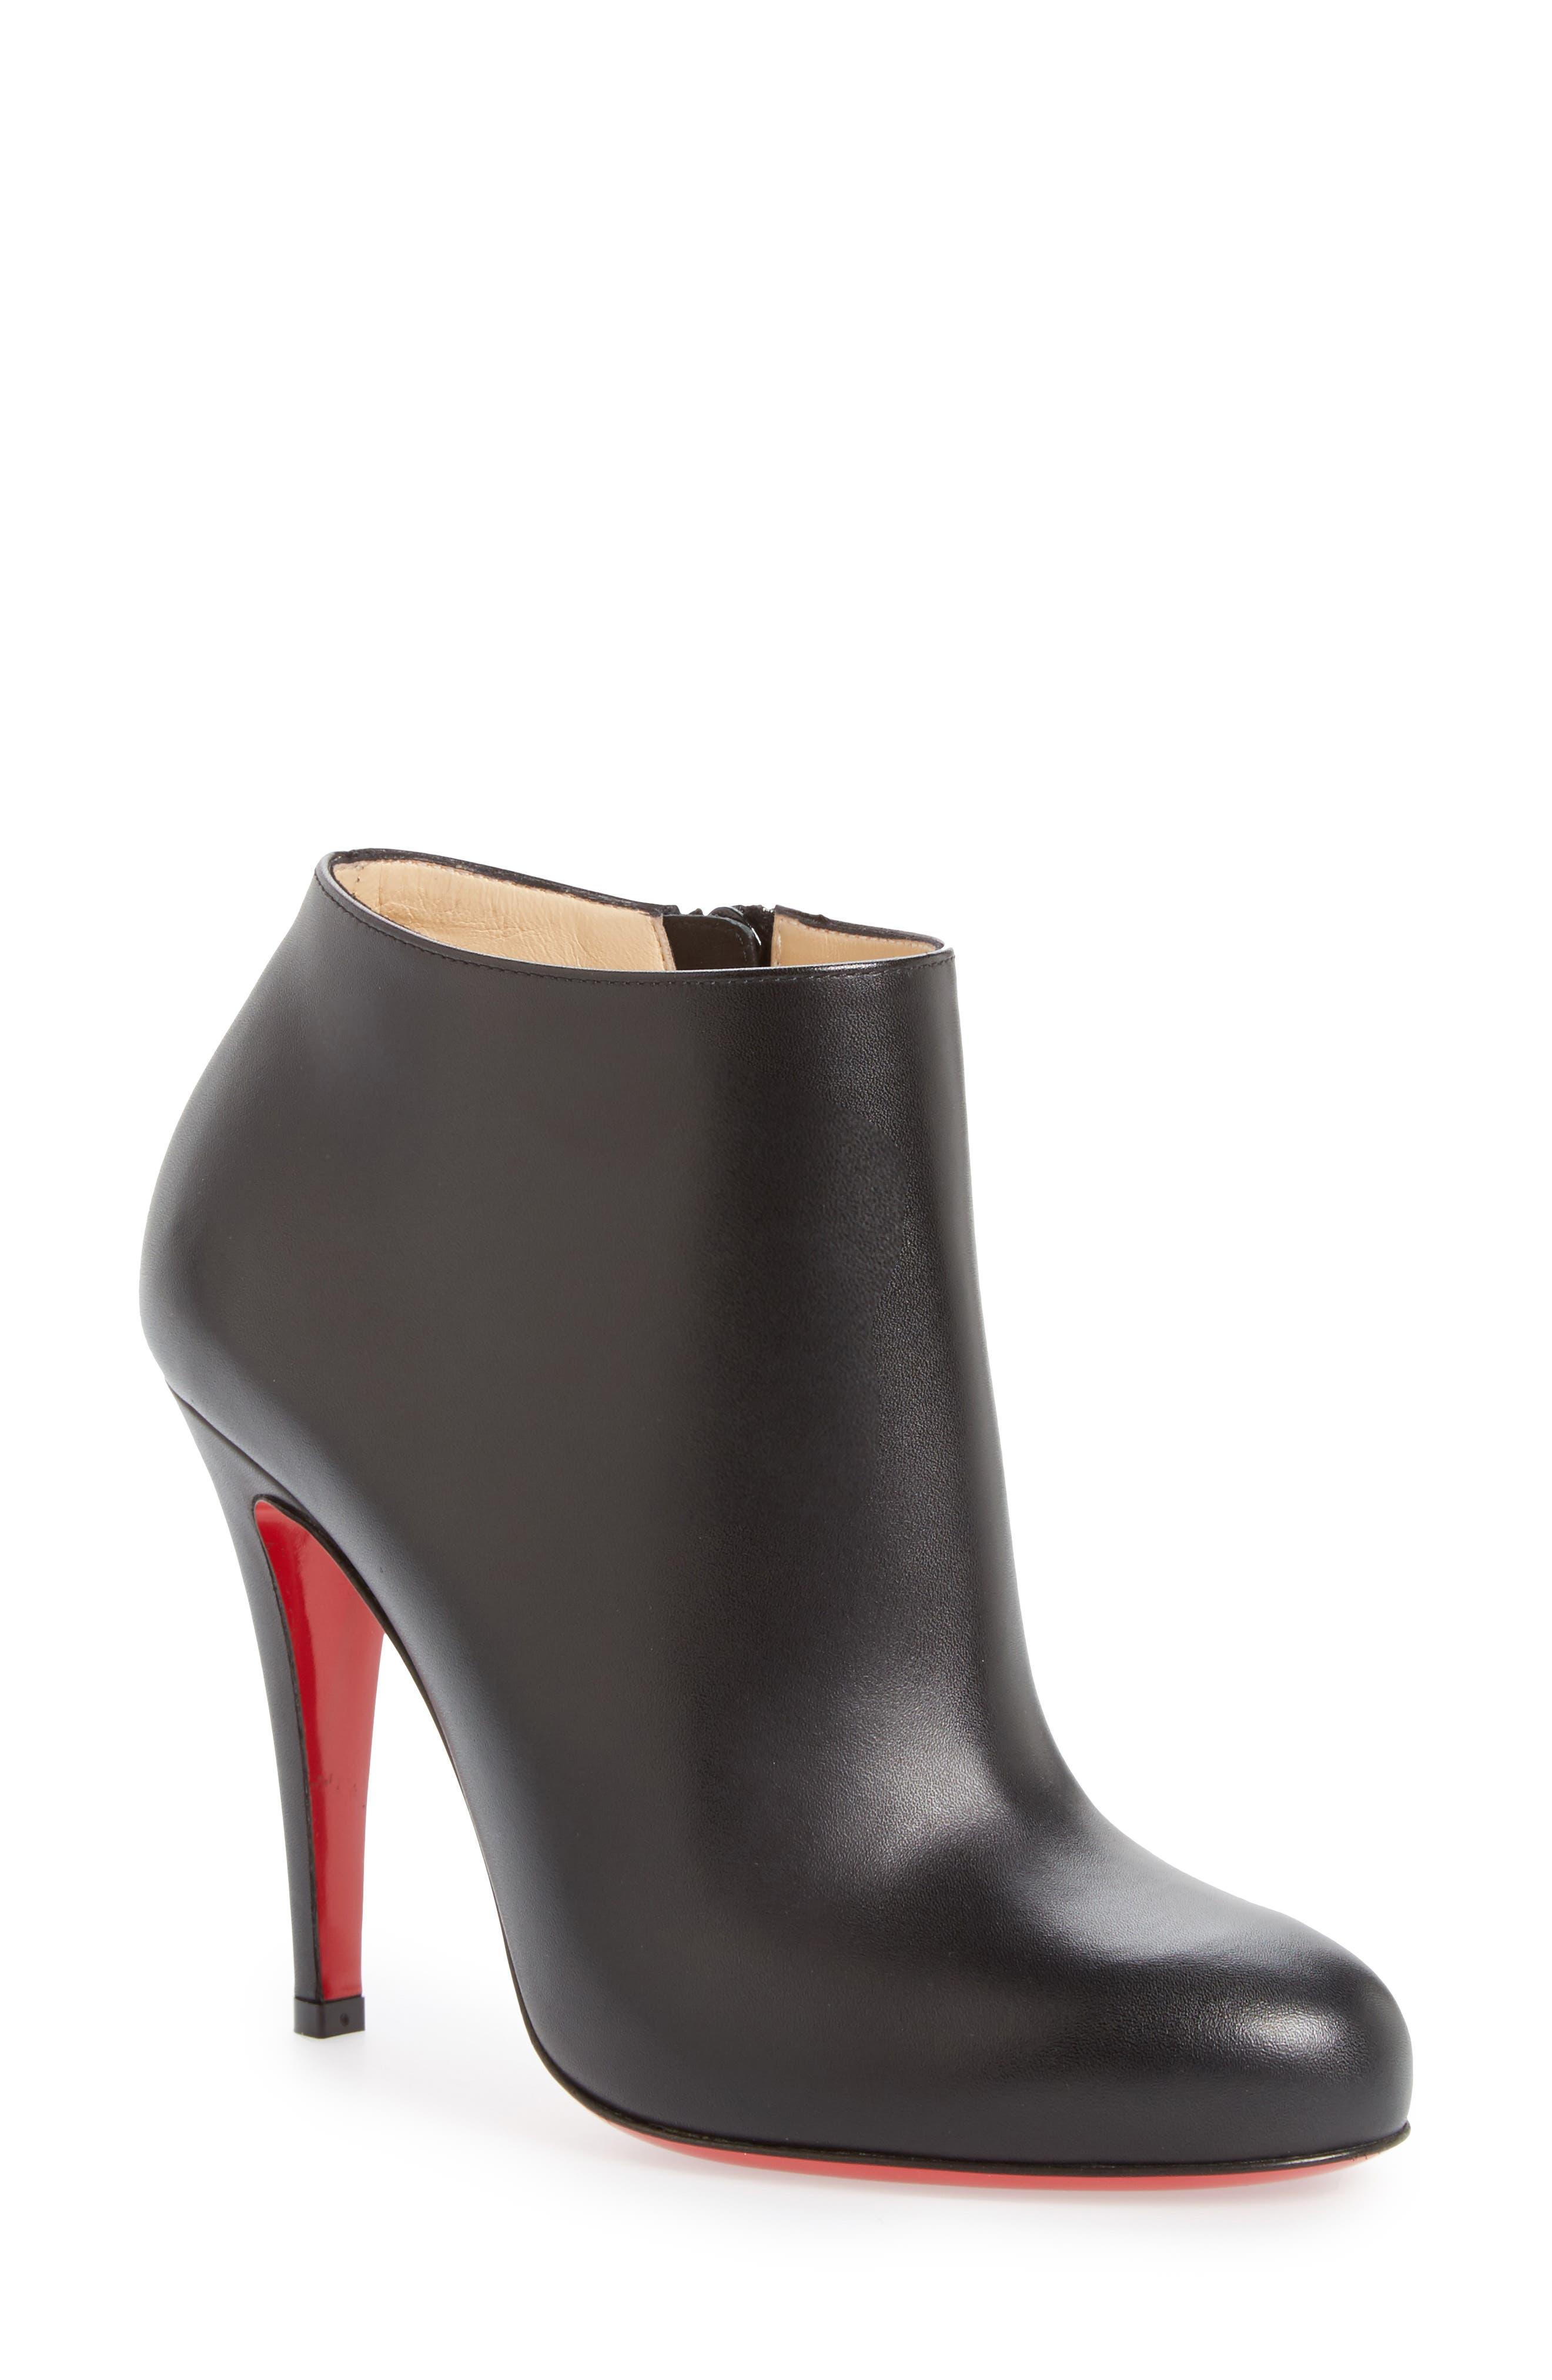 Shaved stilletto heels chained